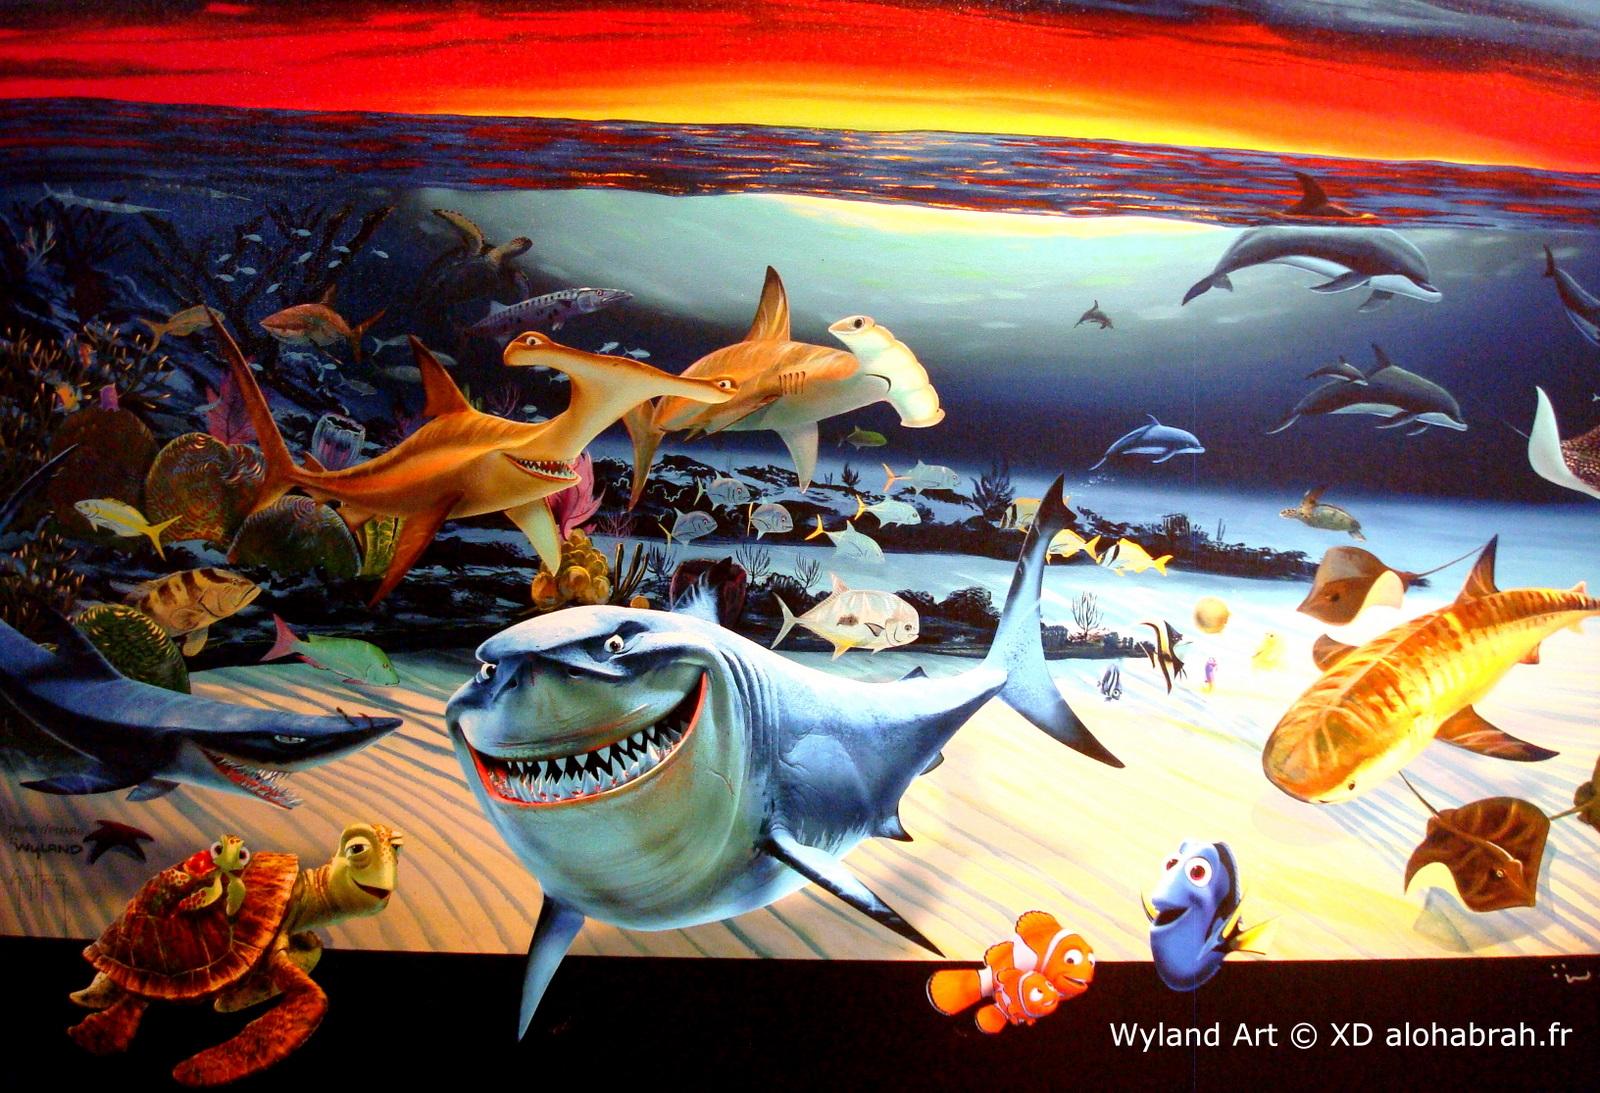 Nemo Characters - Wyland Art © XD alohabrah.fr